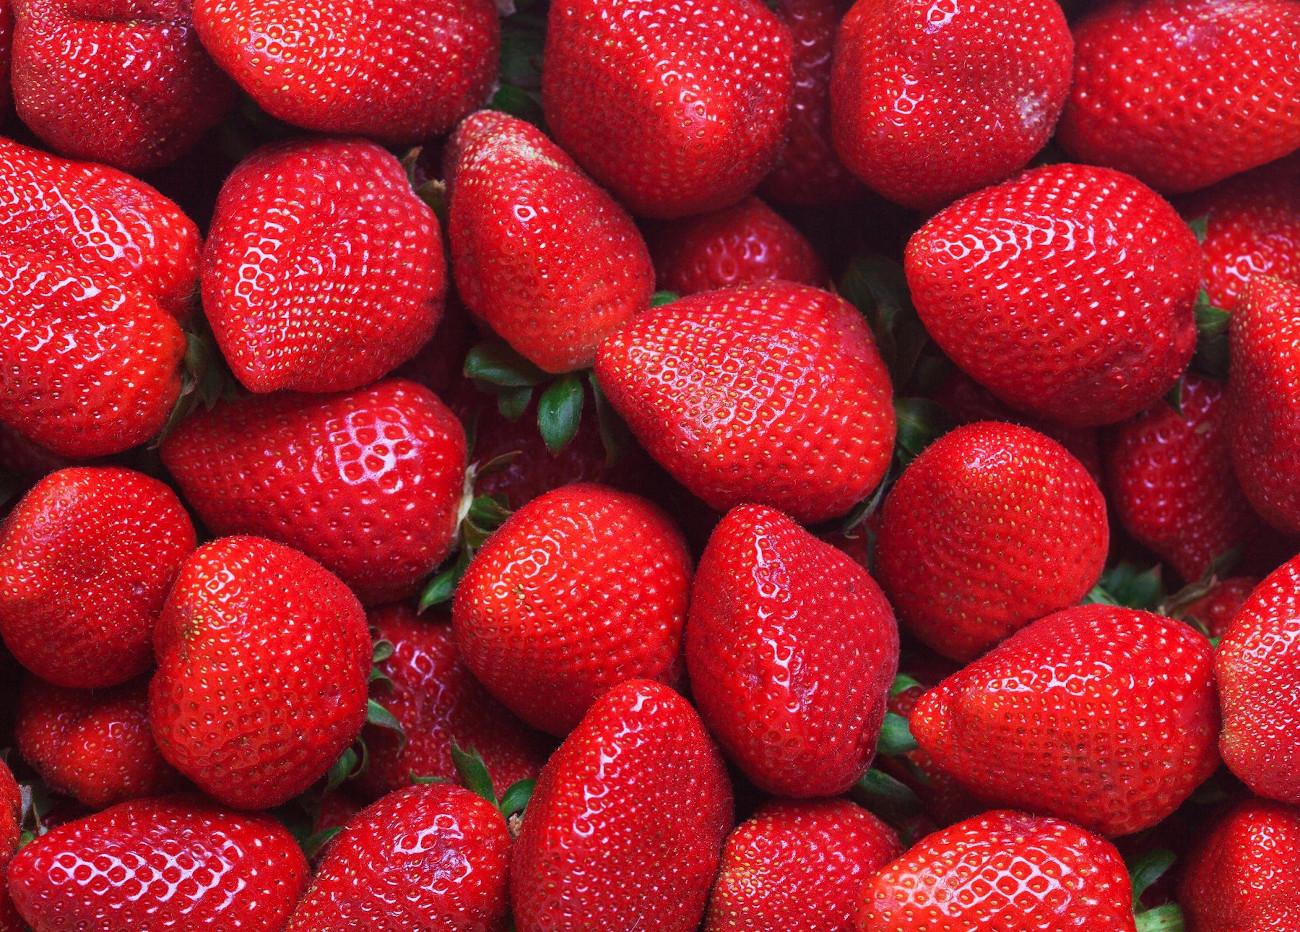 International Strawberry Symposium, postponed until 2021